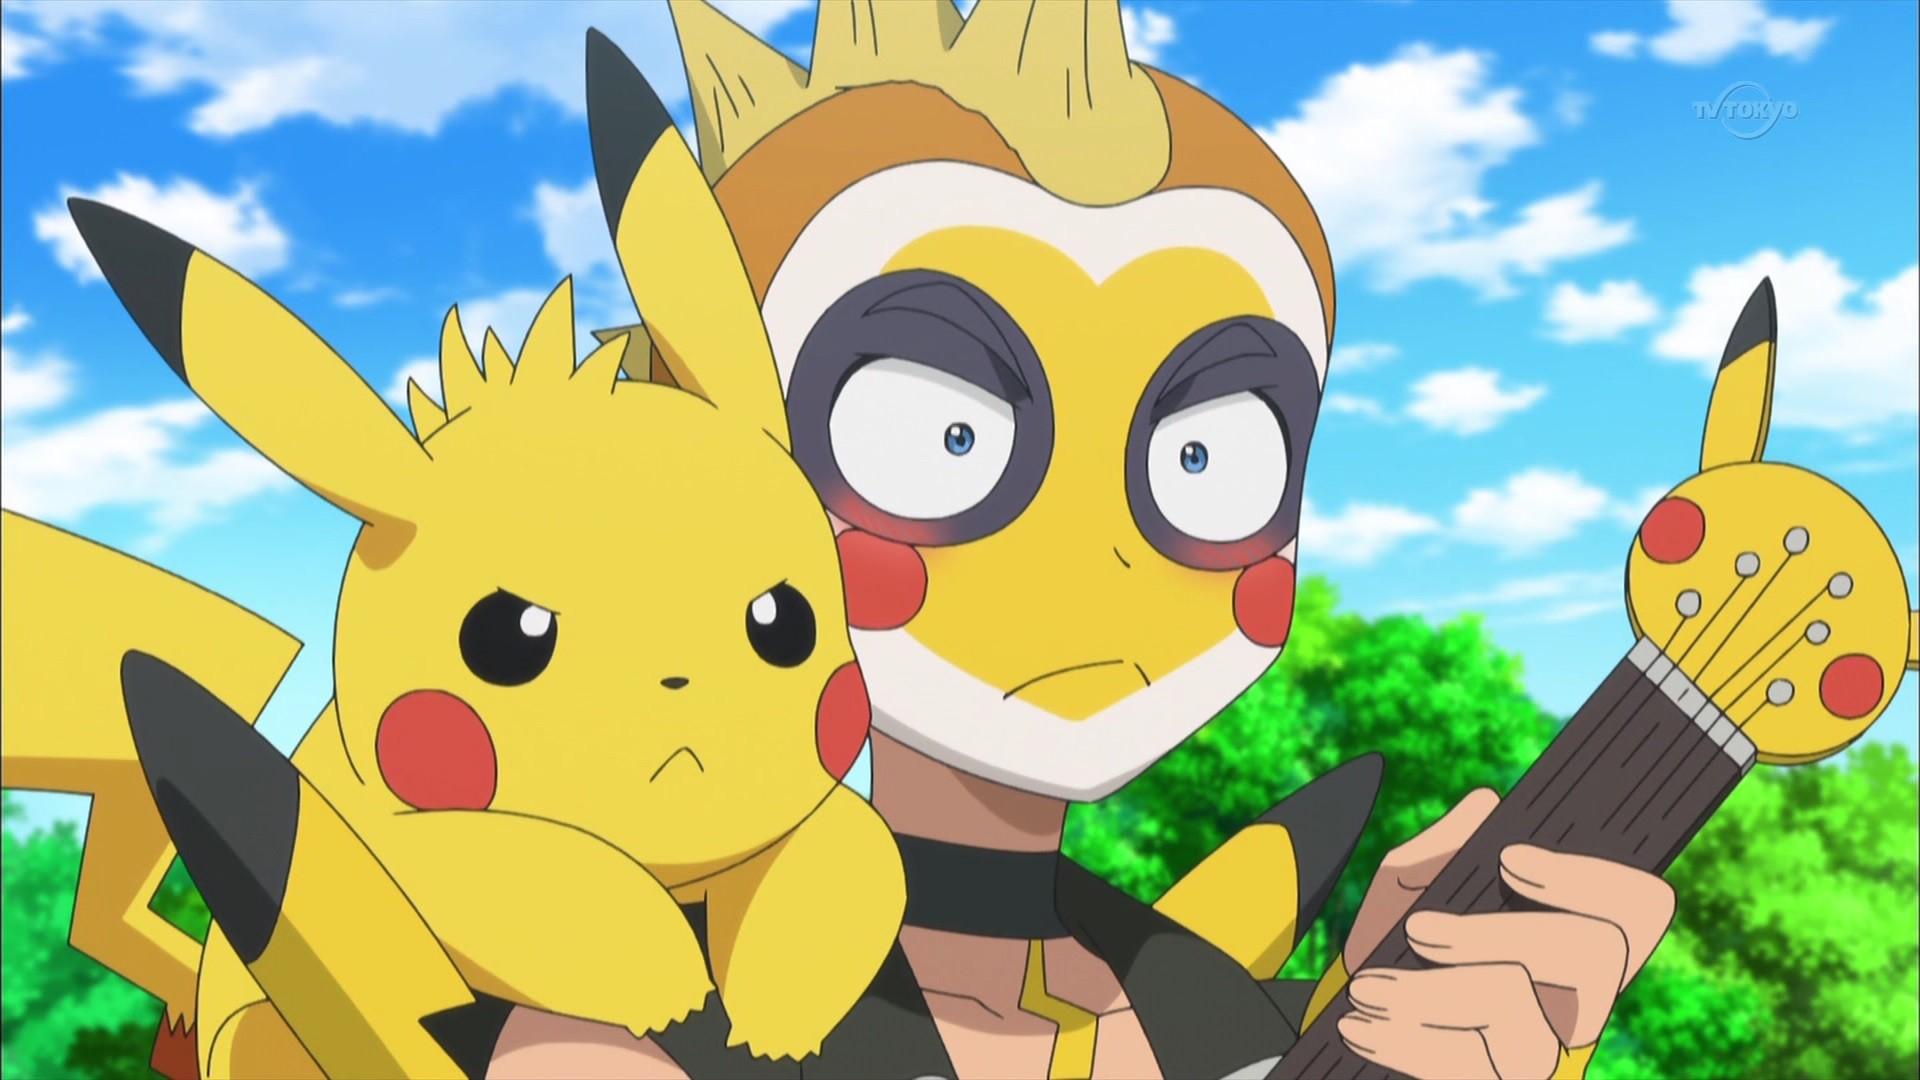 Hair Style Eevee: 【画像】「ポケットモンスター」今週のアニメ「ポケモンXY&Z 第22話」でサトシの服を着た男装セレナが可愛過ぎると大